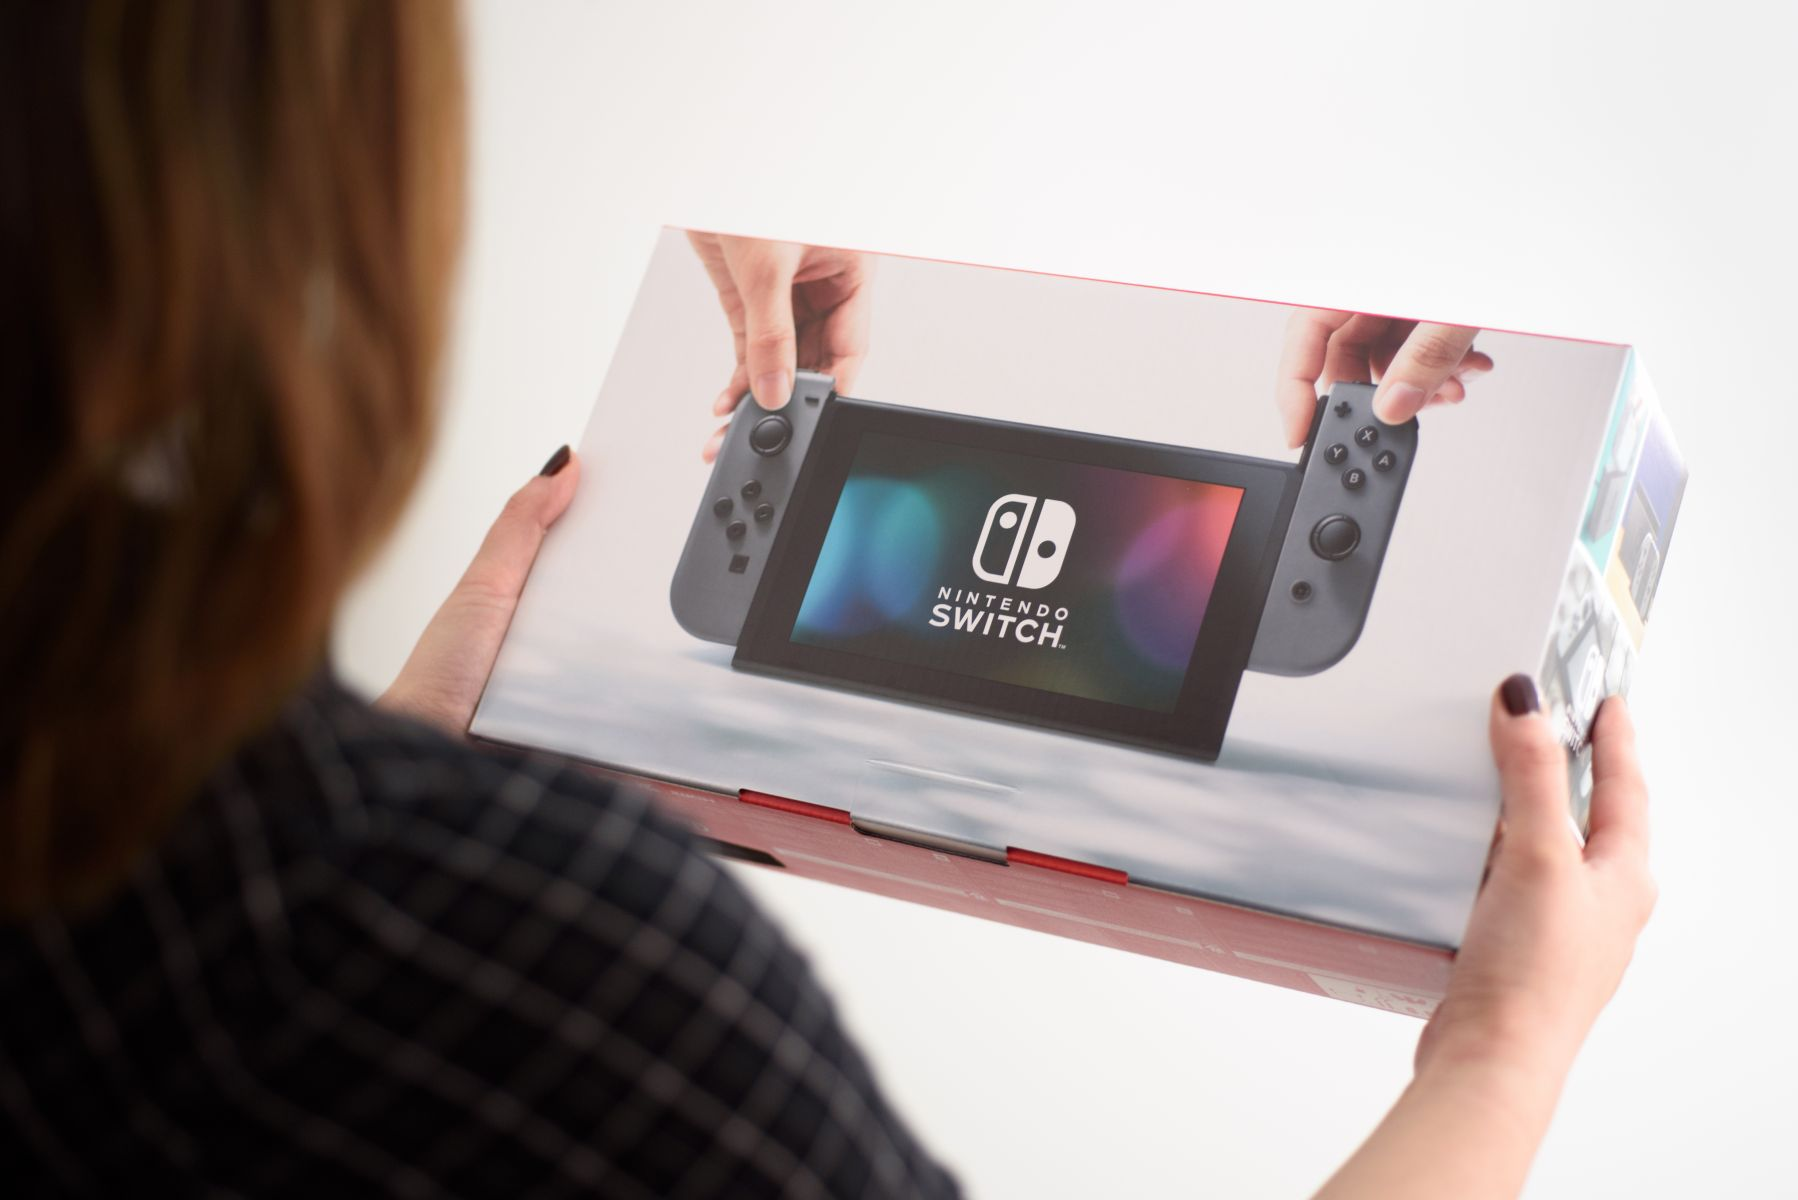 Labo開賣沒用、Switch日本二手價續跌;任天堂逆勢挫